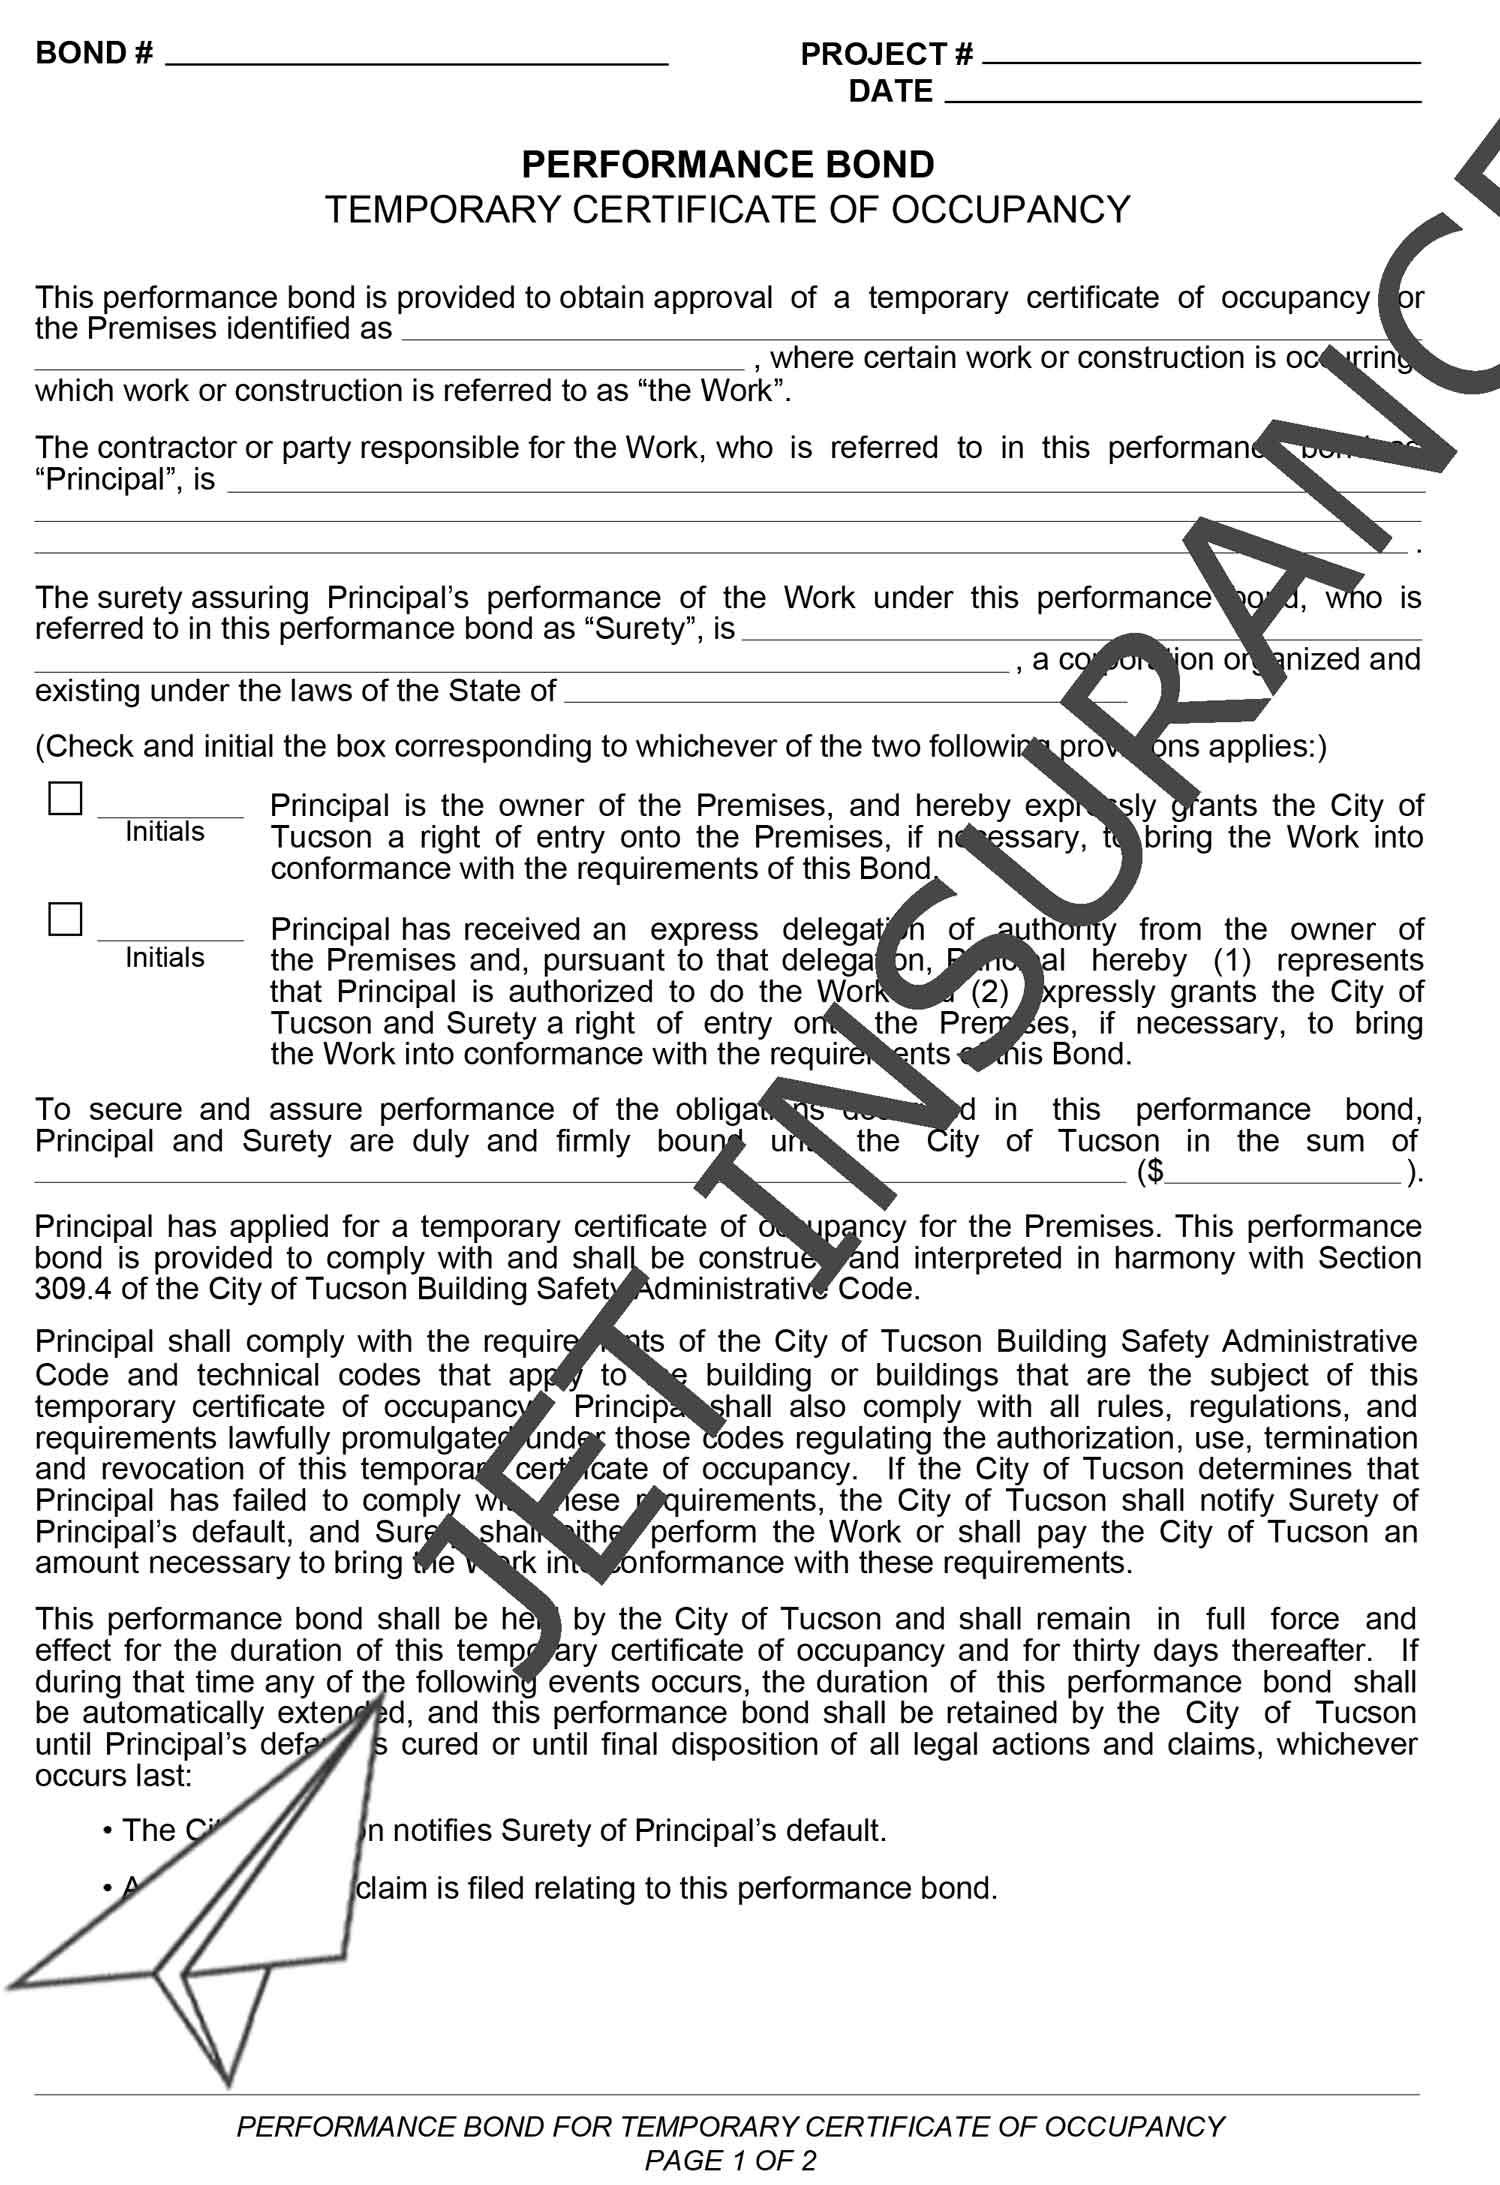 Tucson Arizona Temporary Certificate of Occupancy Performance Bond